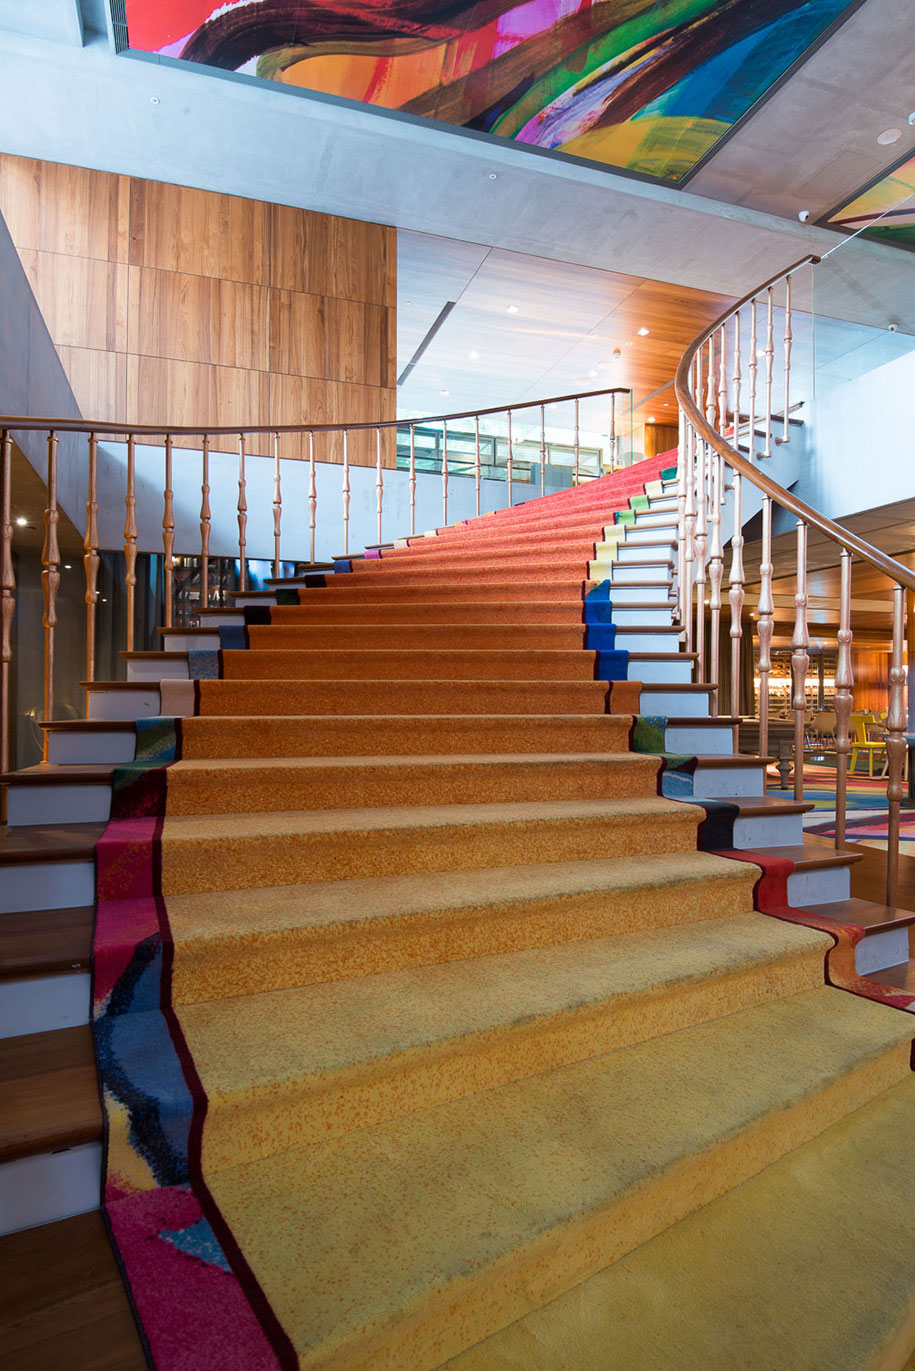 S Hotel Phillipe Stark staircase